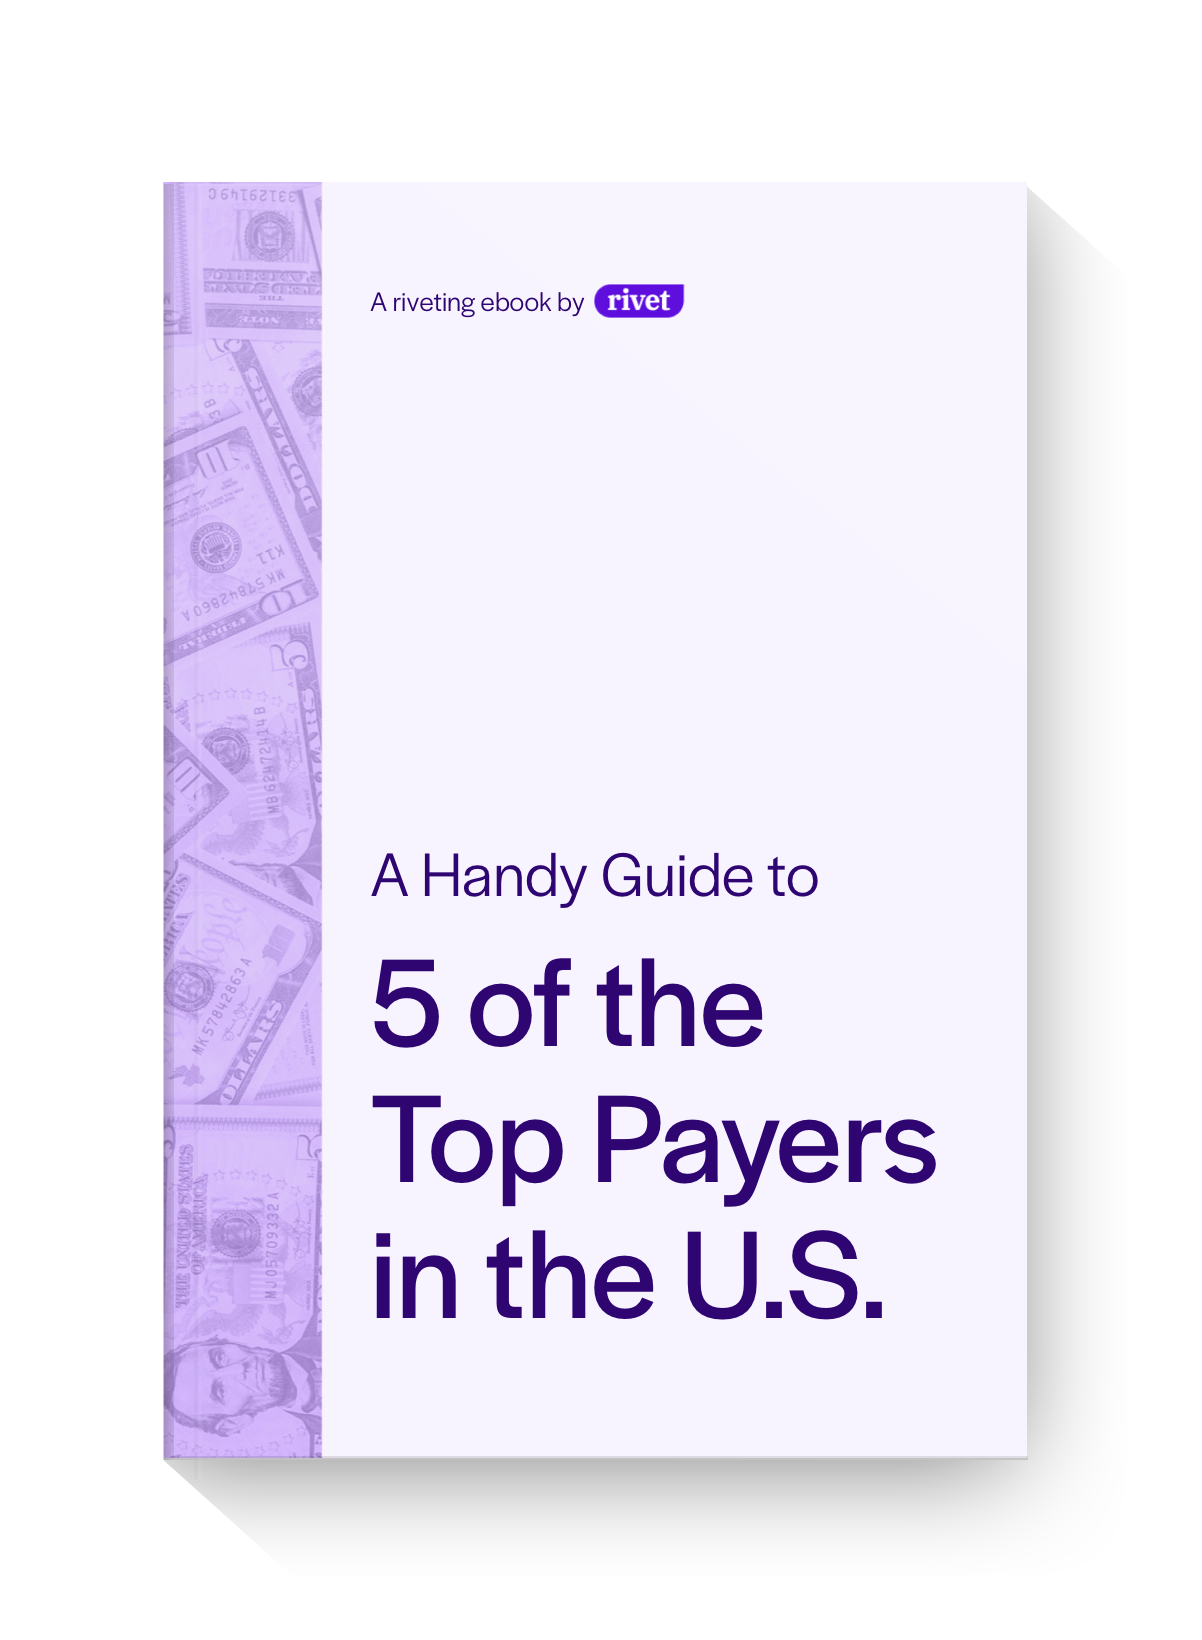 Mockup-Top 5 Payers